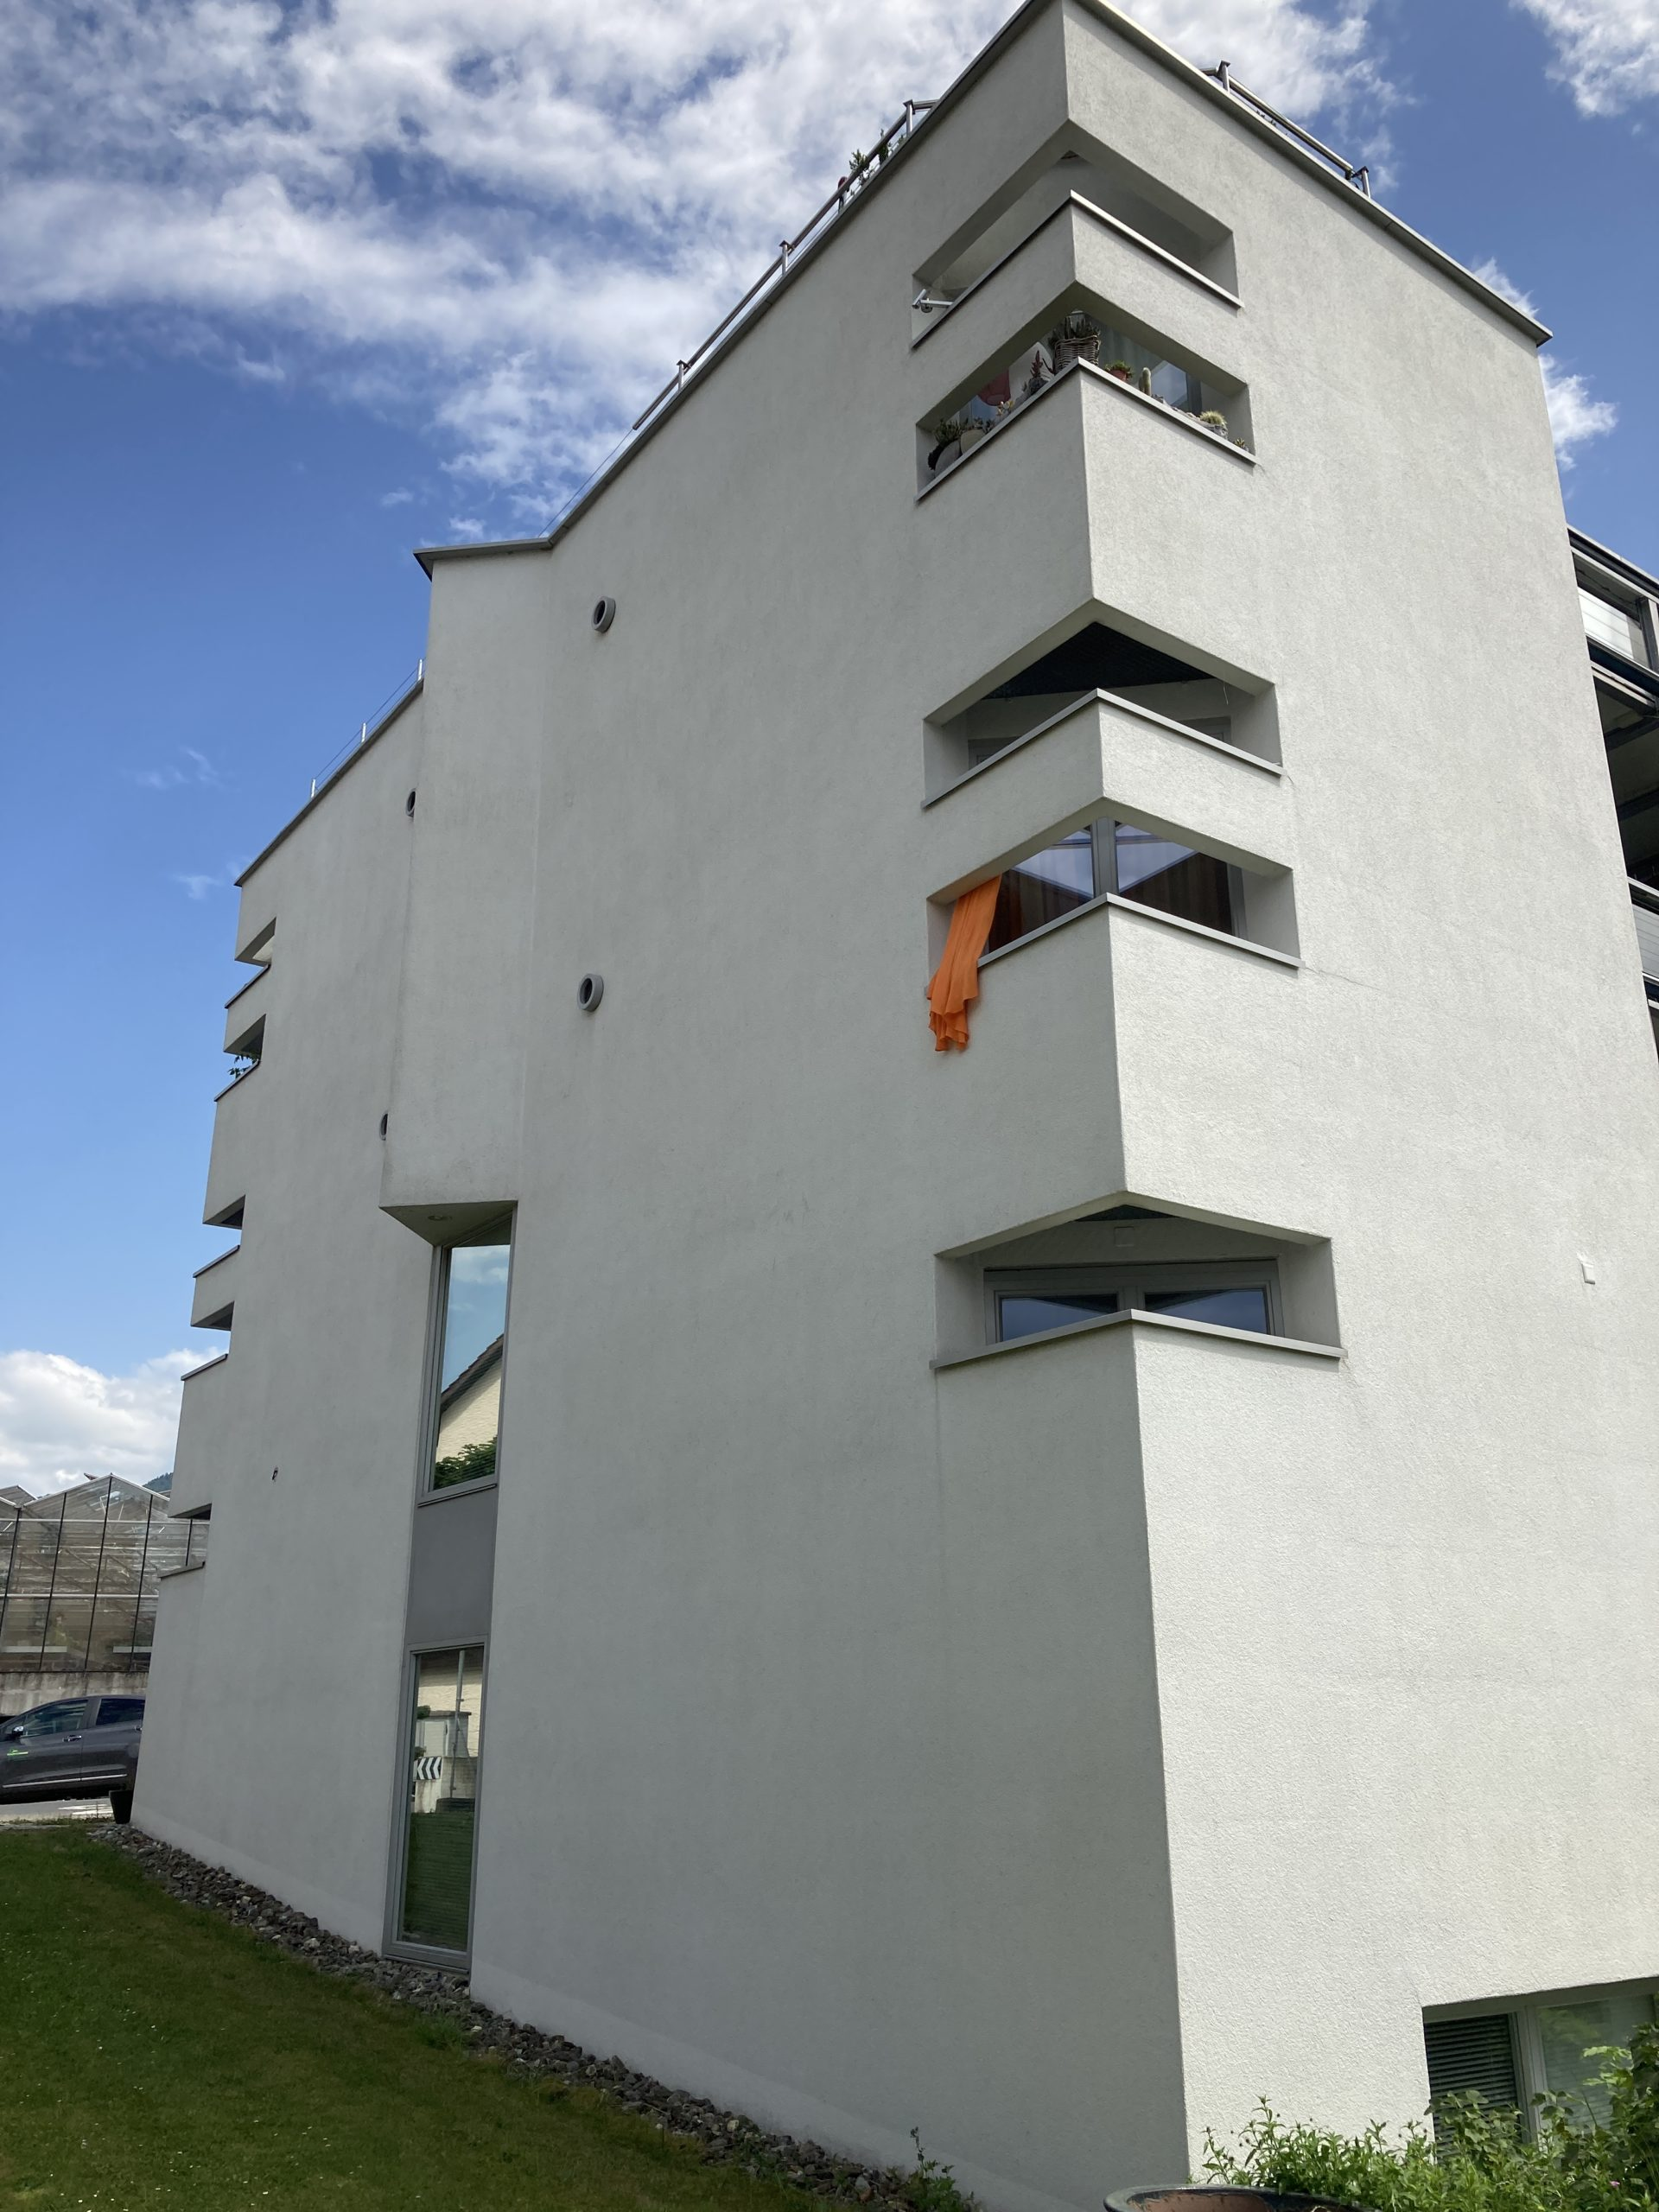 https://www.koster-gs.ch/wp-content/uploads/2021/07/Reichmuth-2-Fassade-Nord-nachher-scaled.jpg